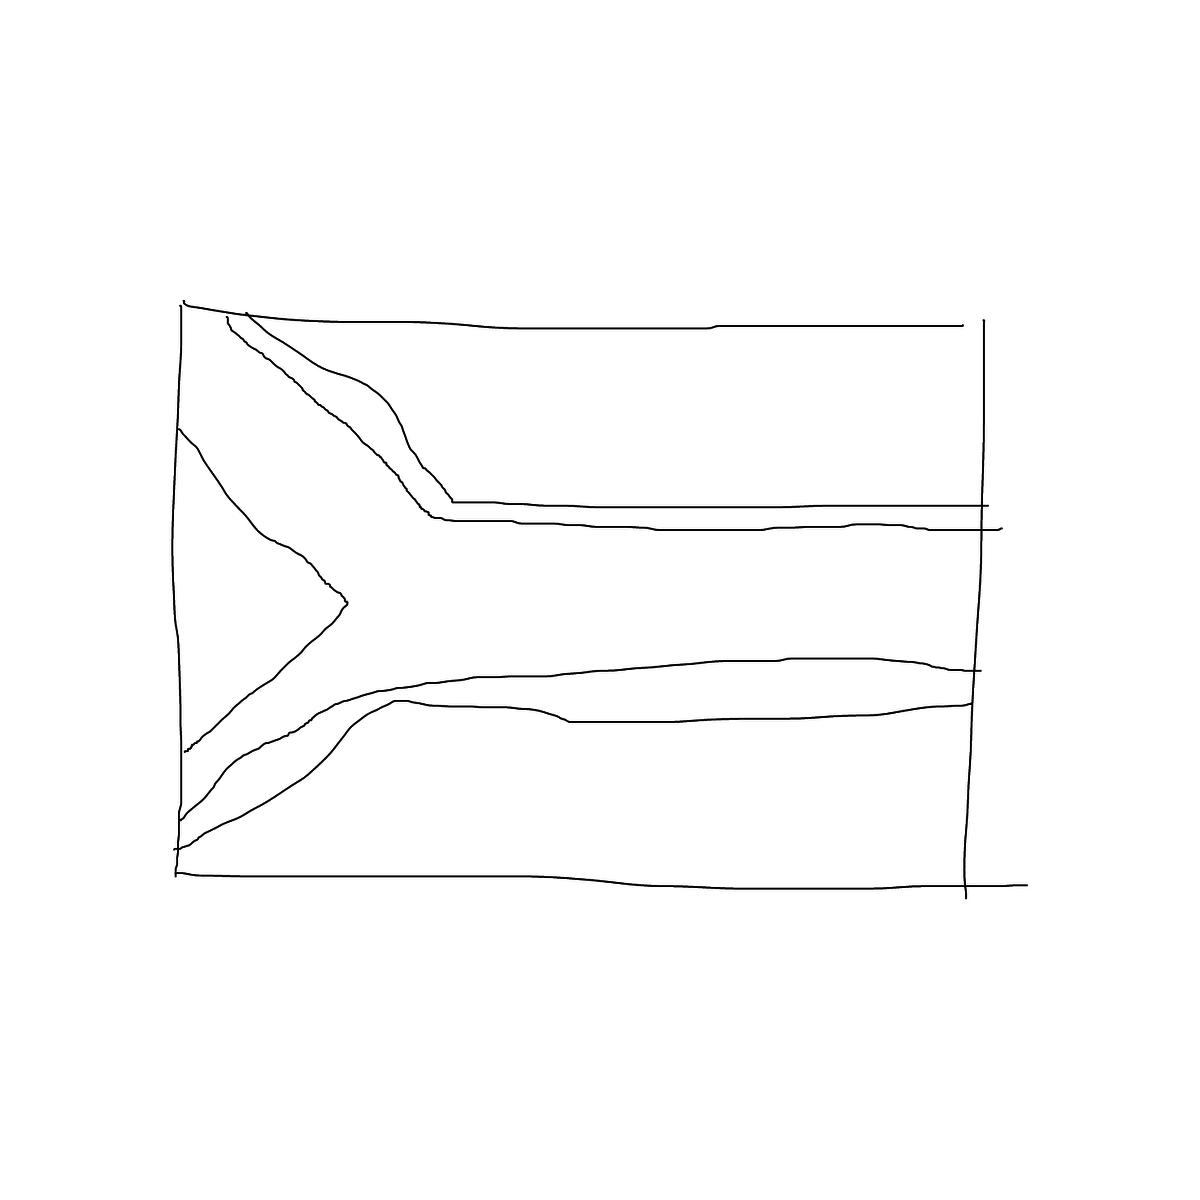 BAAAM drawing#9167 lat:52.0847930908203100lng: 5.1688446998596190